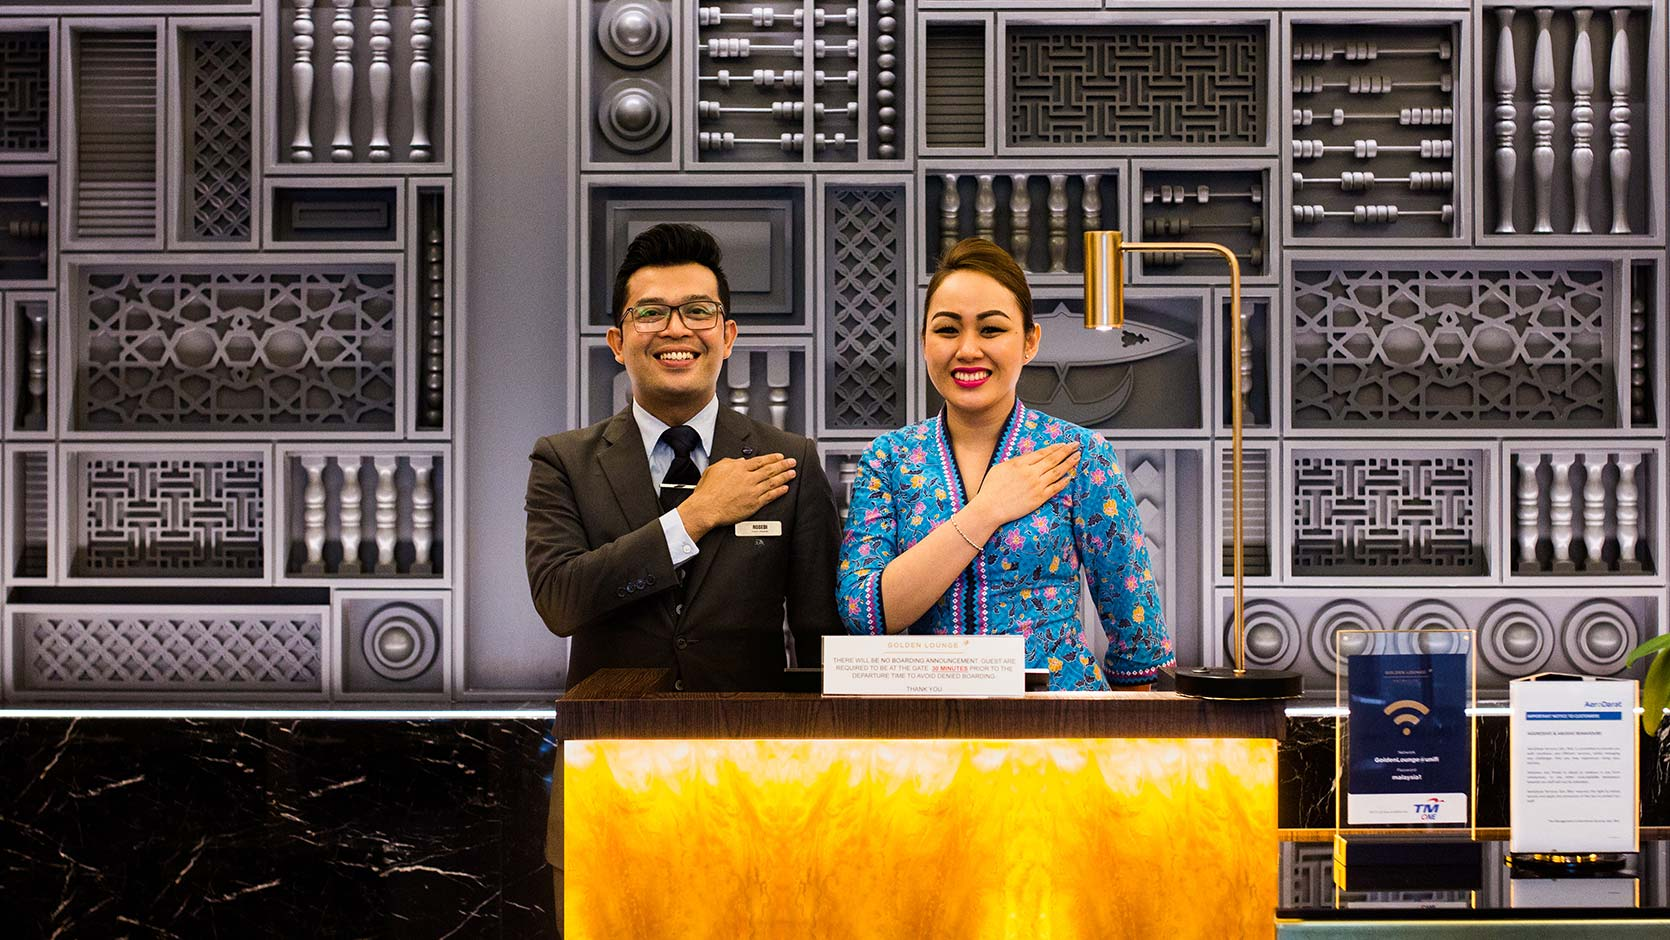 staf Malaysia airlines akan sambut anda semula